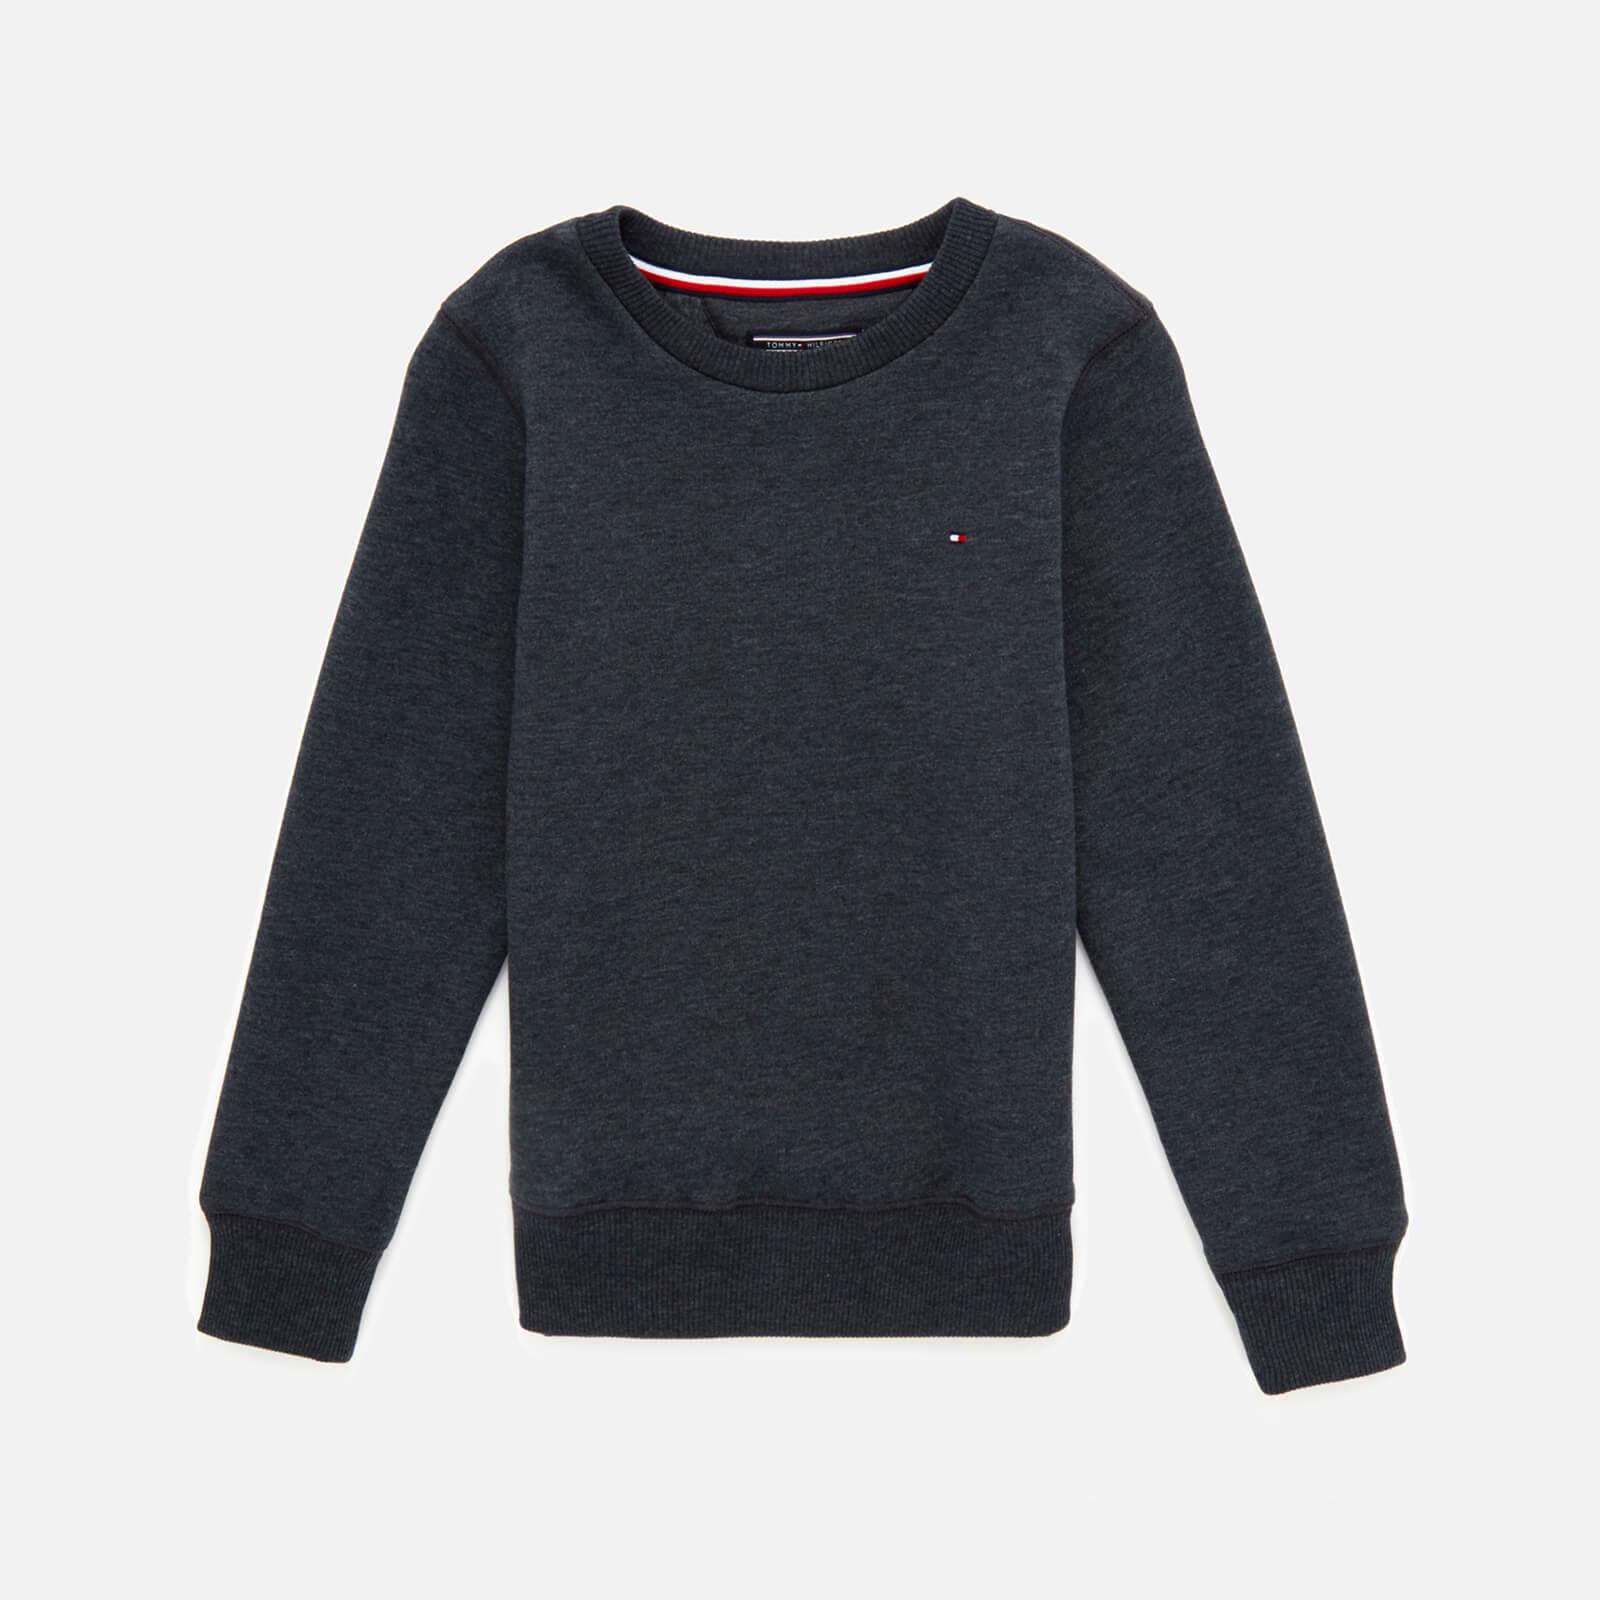 Tommy Kids Boys' Basic Sweatshirt - Sky Captain - 14 Years